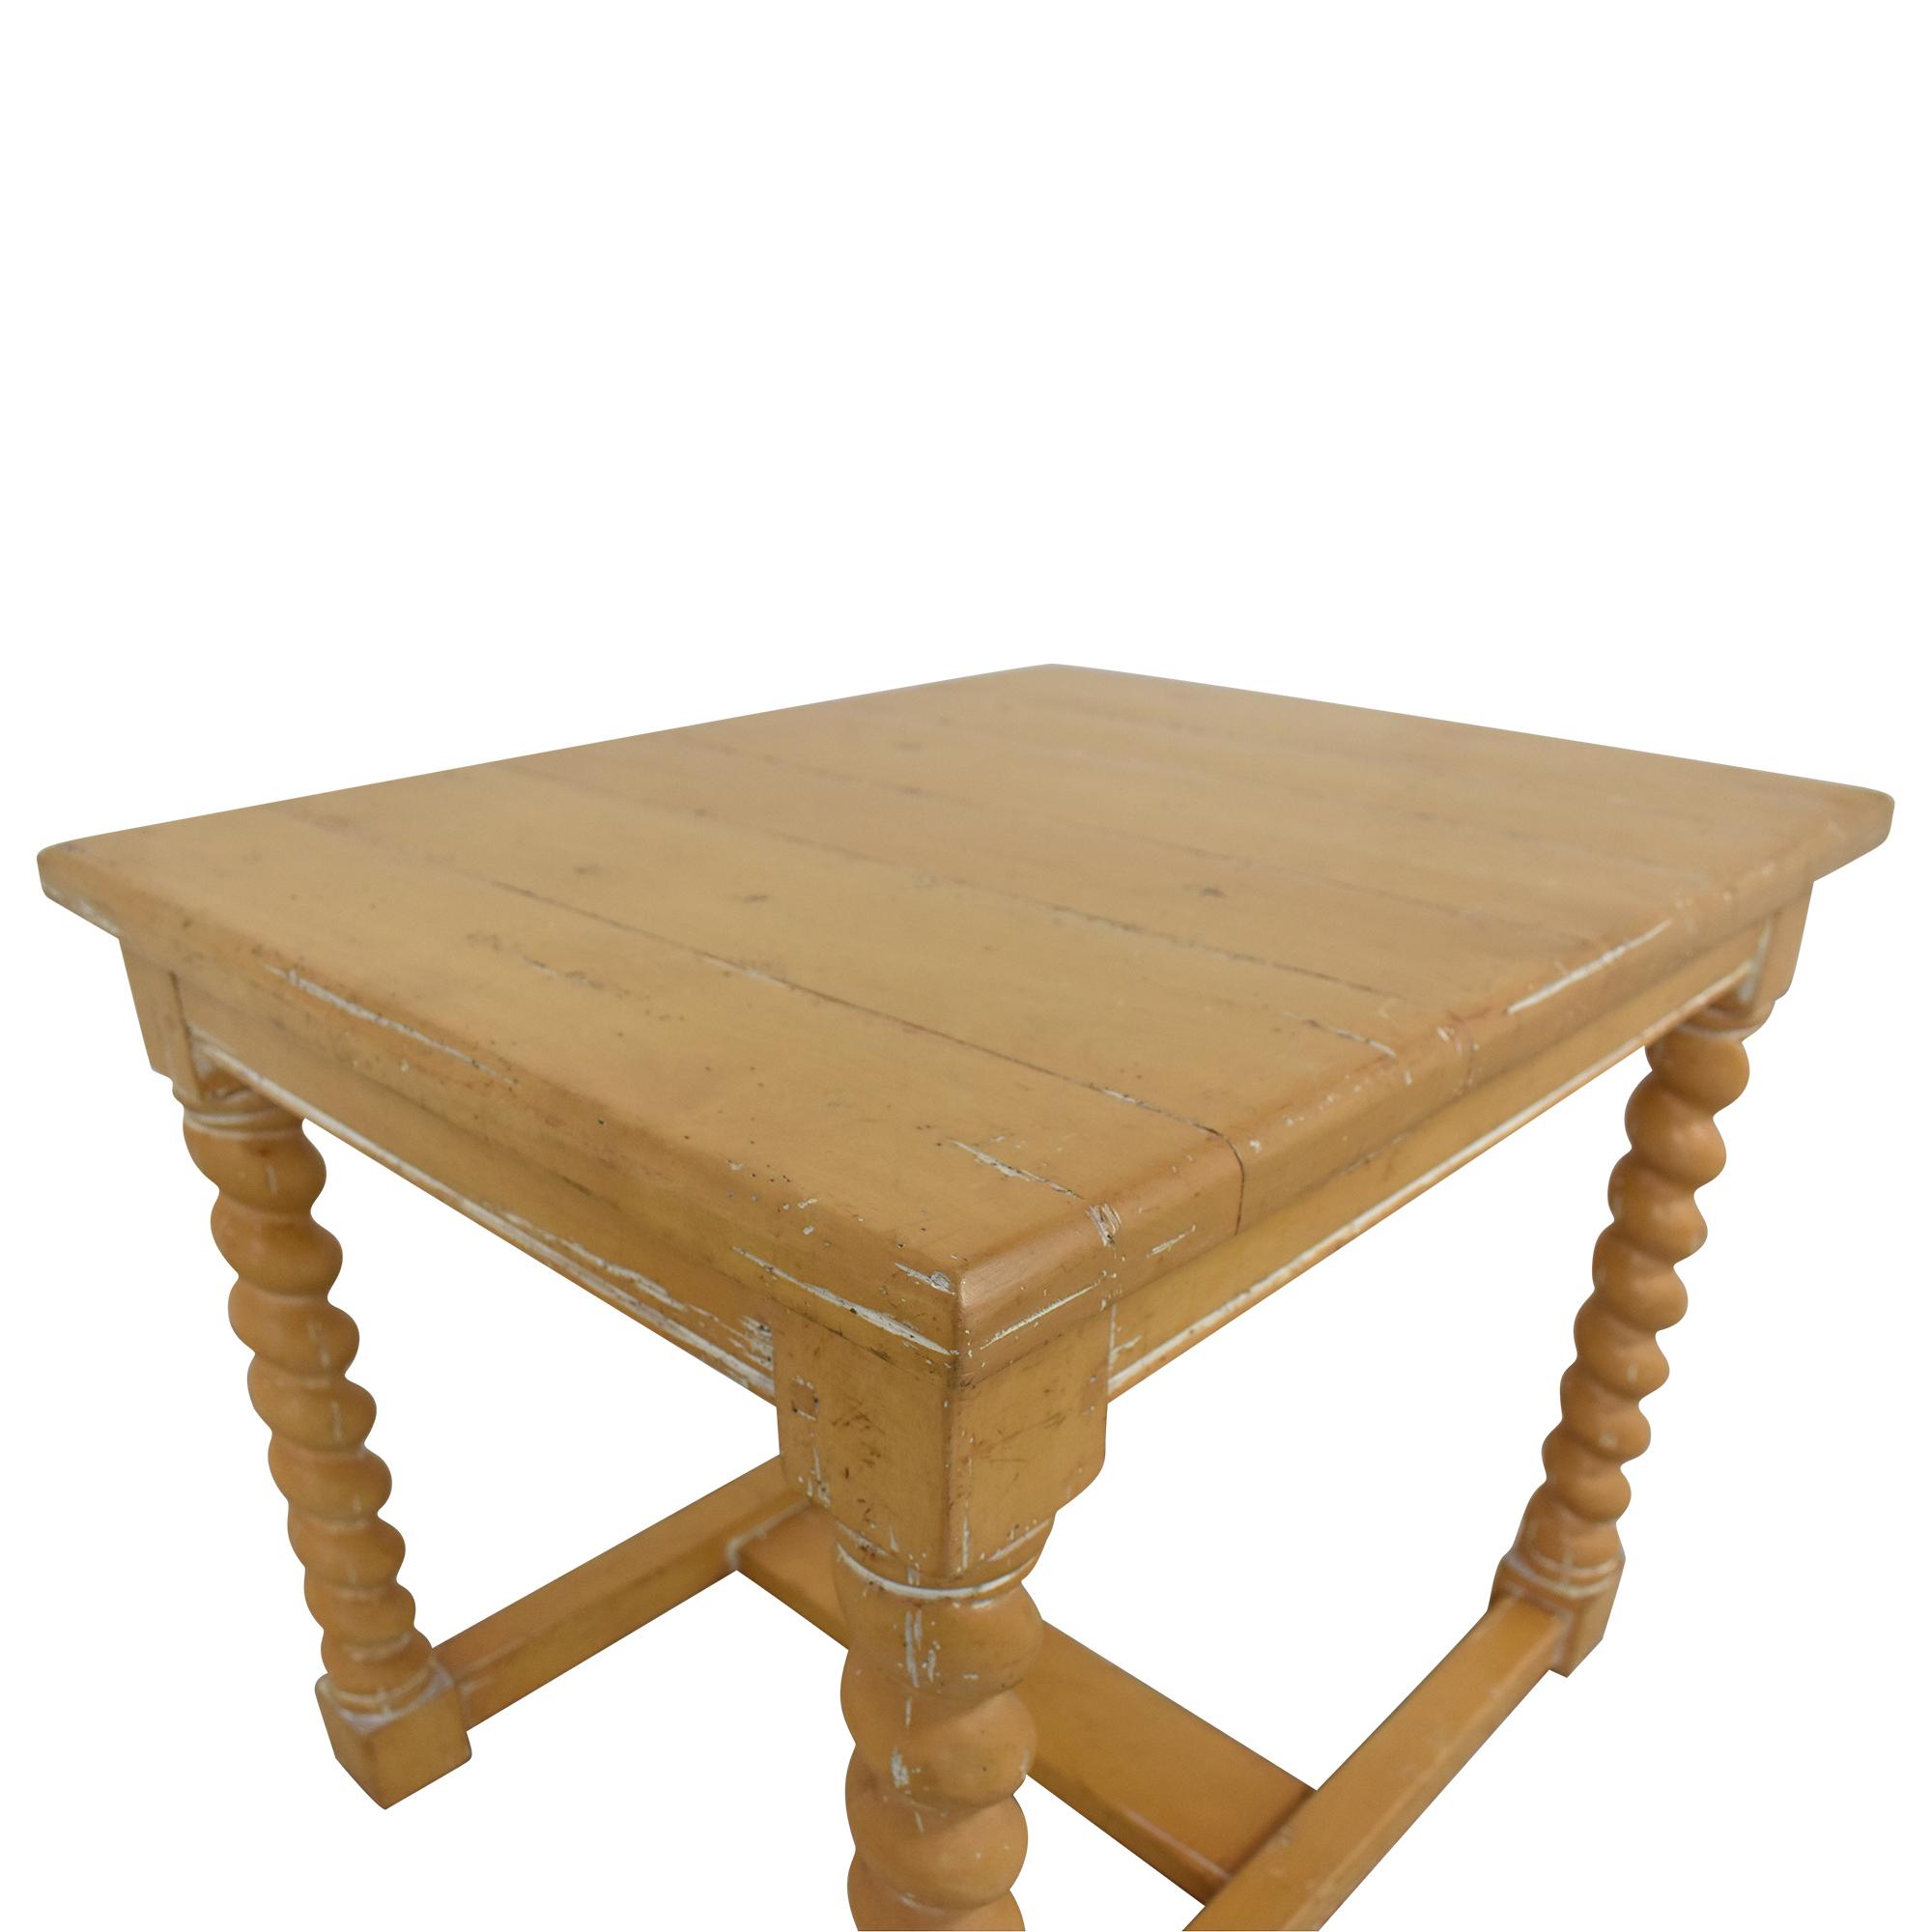 Guy Chaddock & Co. Guy Chaddock Barley Twist Lamp Table Tables